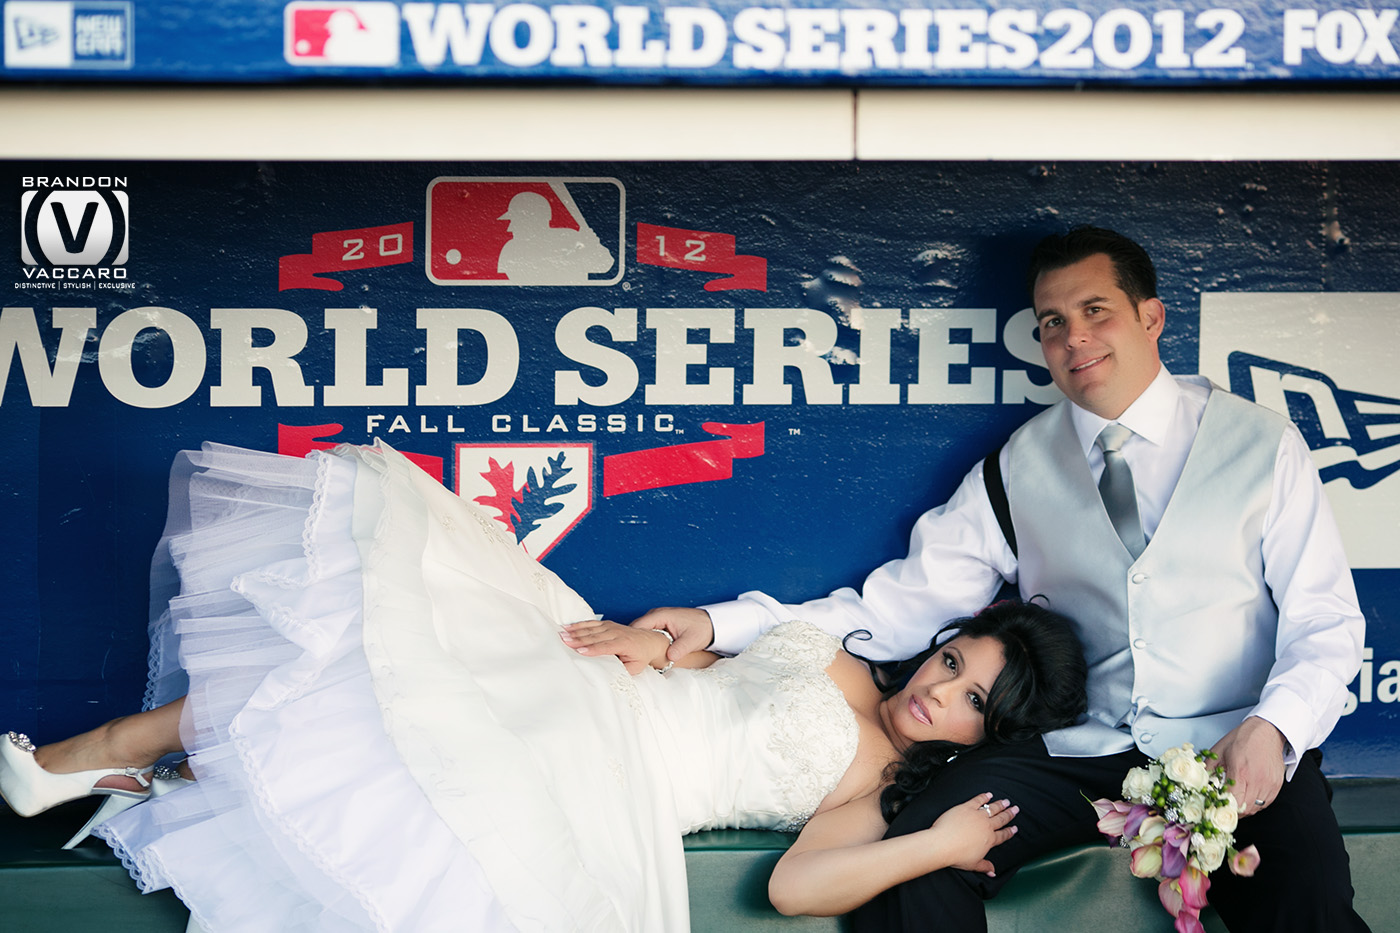 real-wedding-san-francisco-giants-stadium-att-park-bride-and-groom.jpg